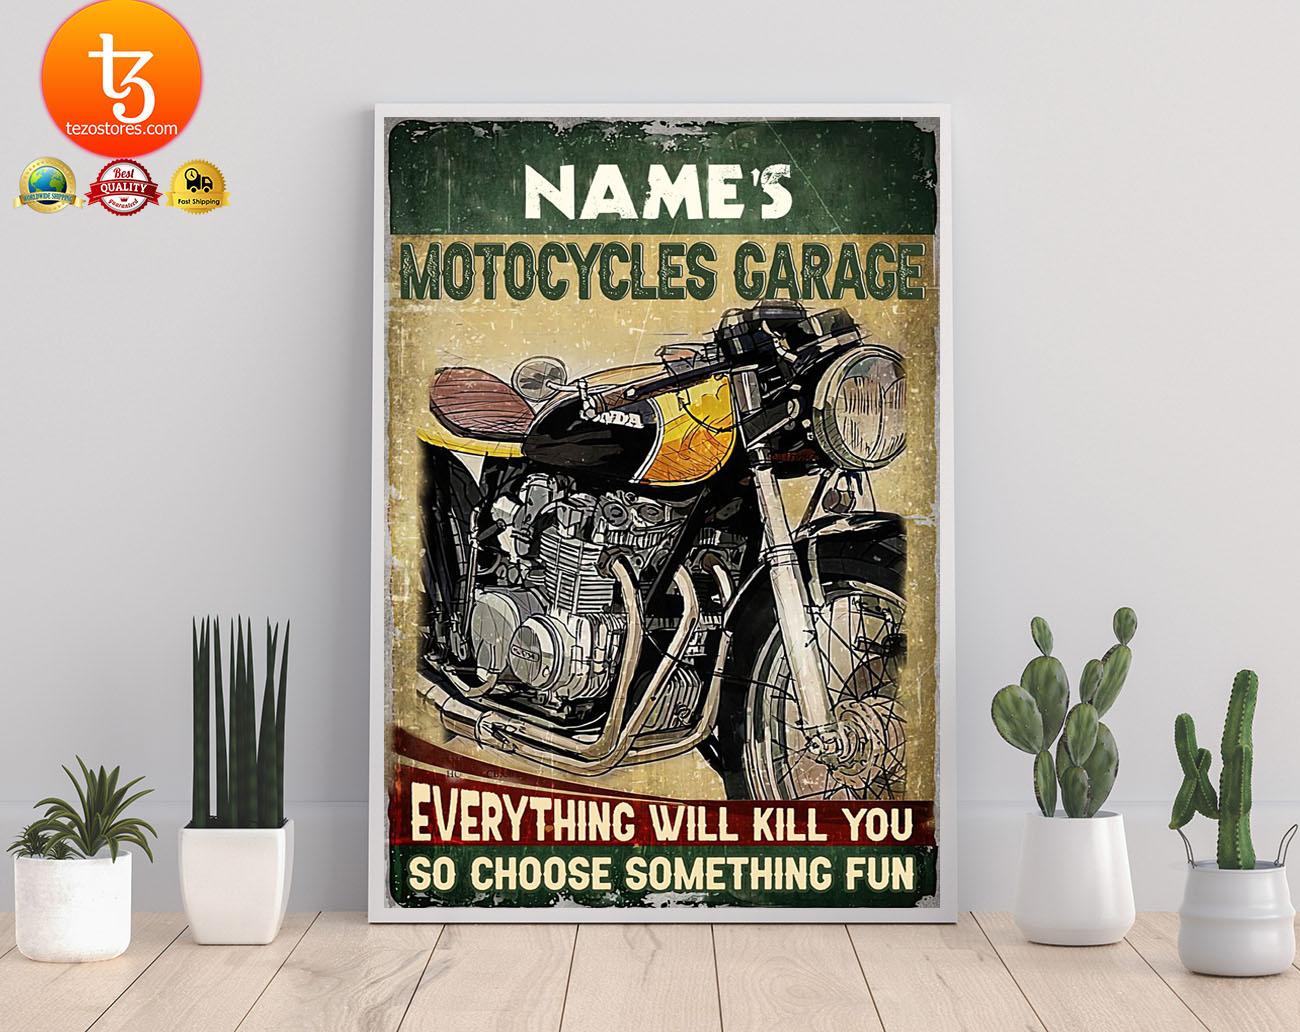 Motocycles garage eveyrthing will kill you so choose something fun custom name poster 3